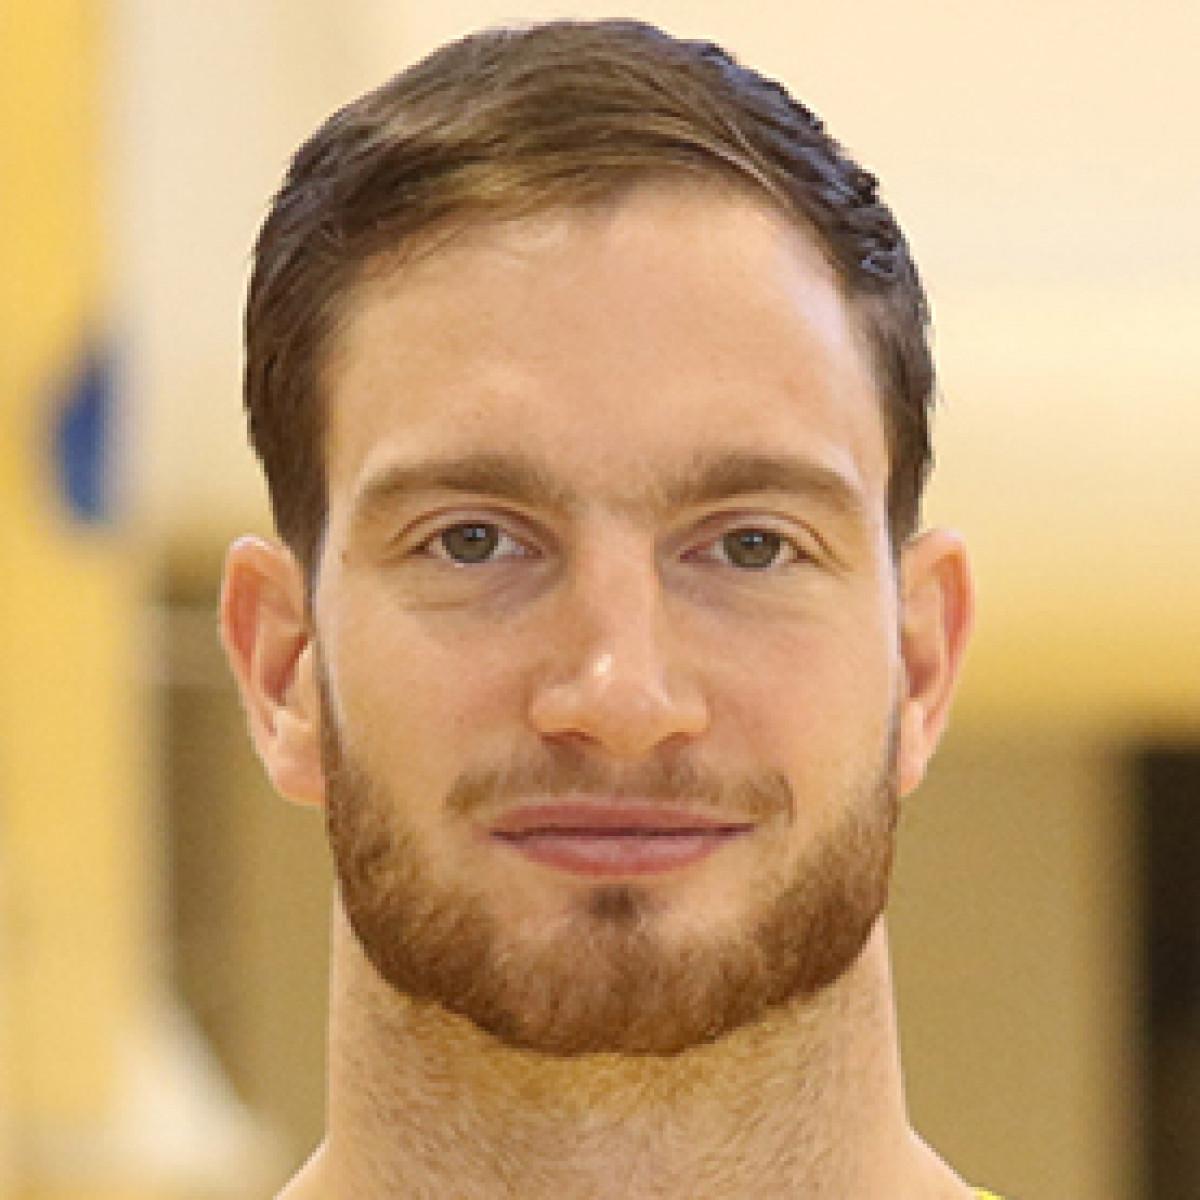 Pavle Marcinkovic